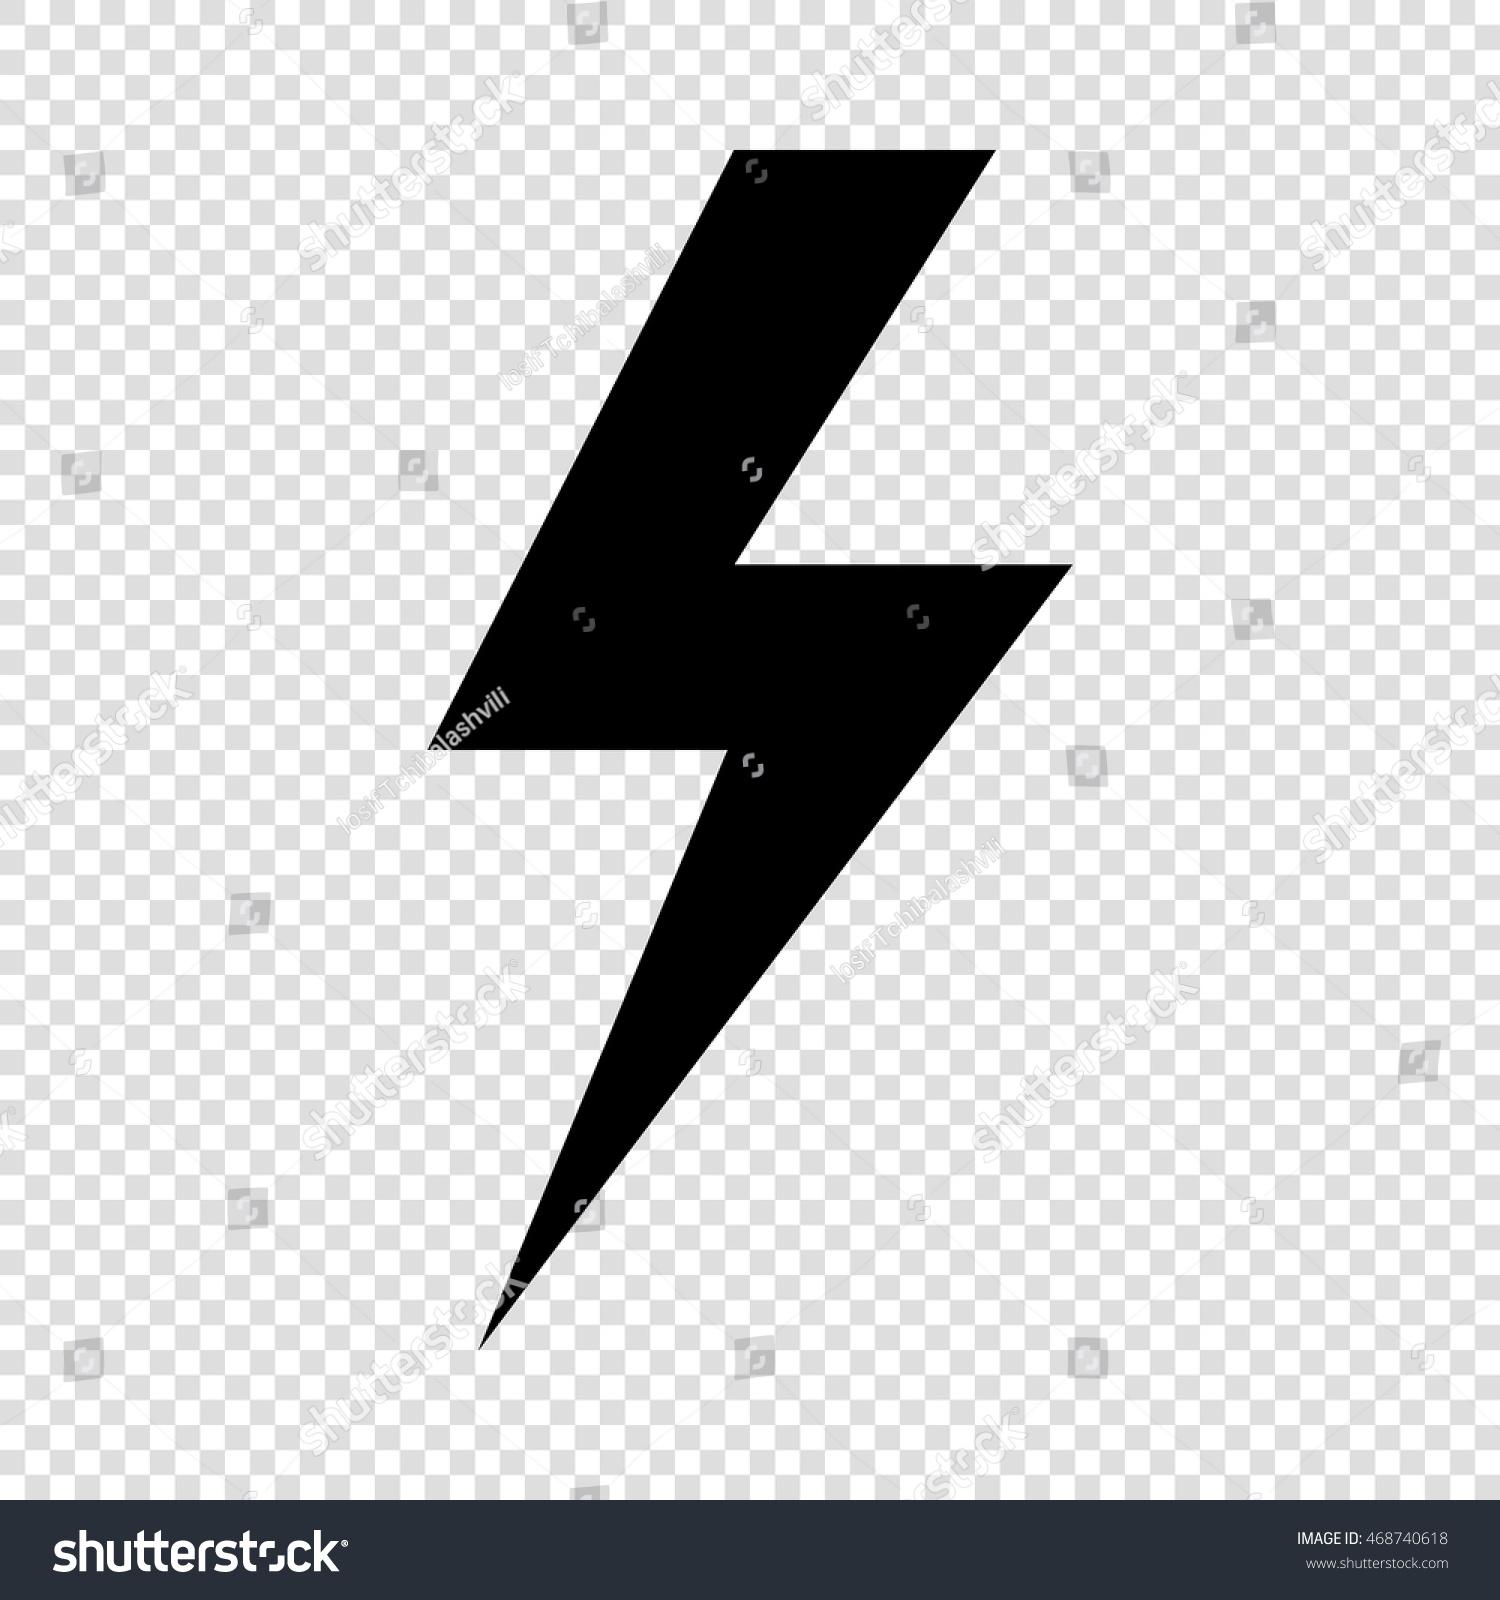 Lightning Flat Icons Set Black On Transparent Background